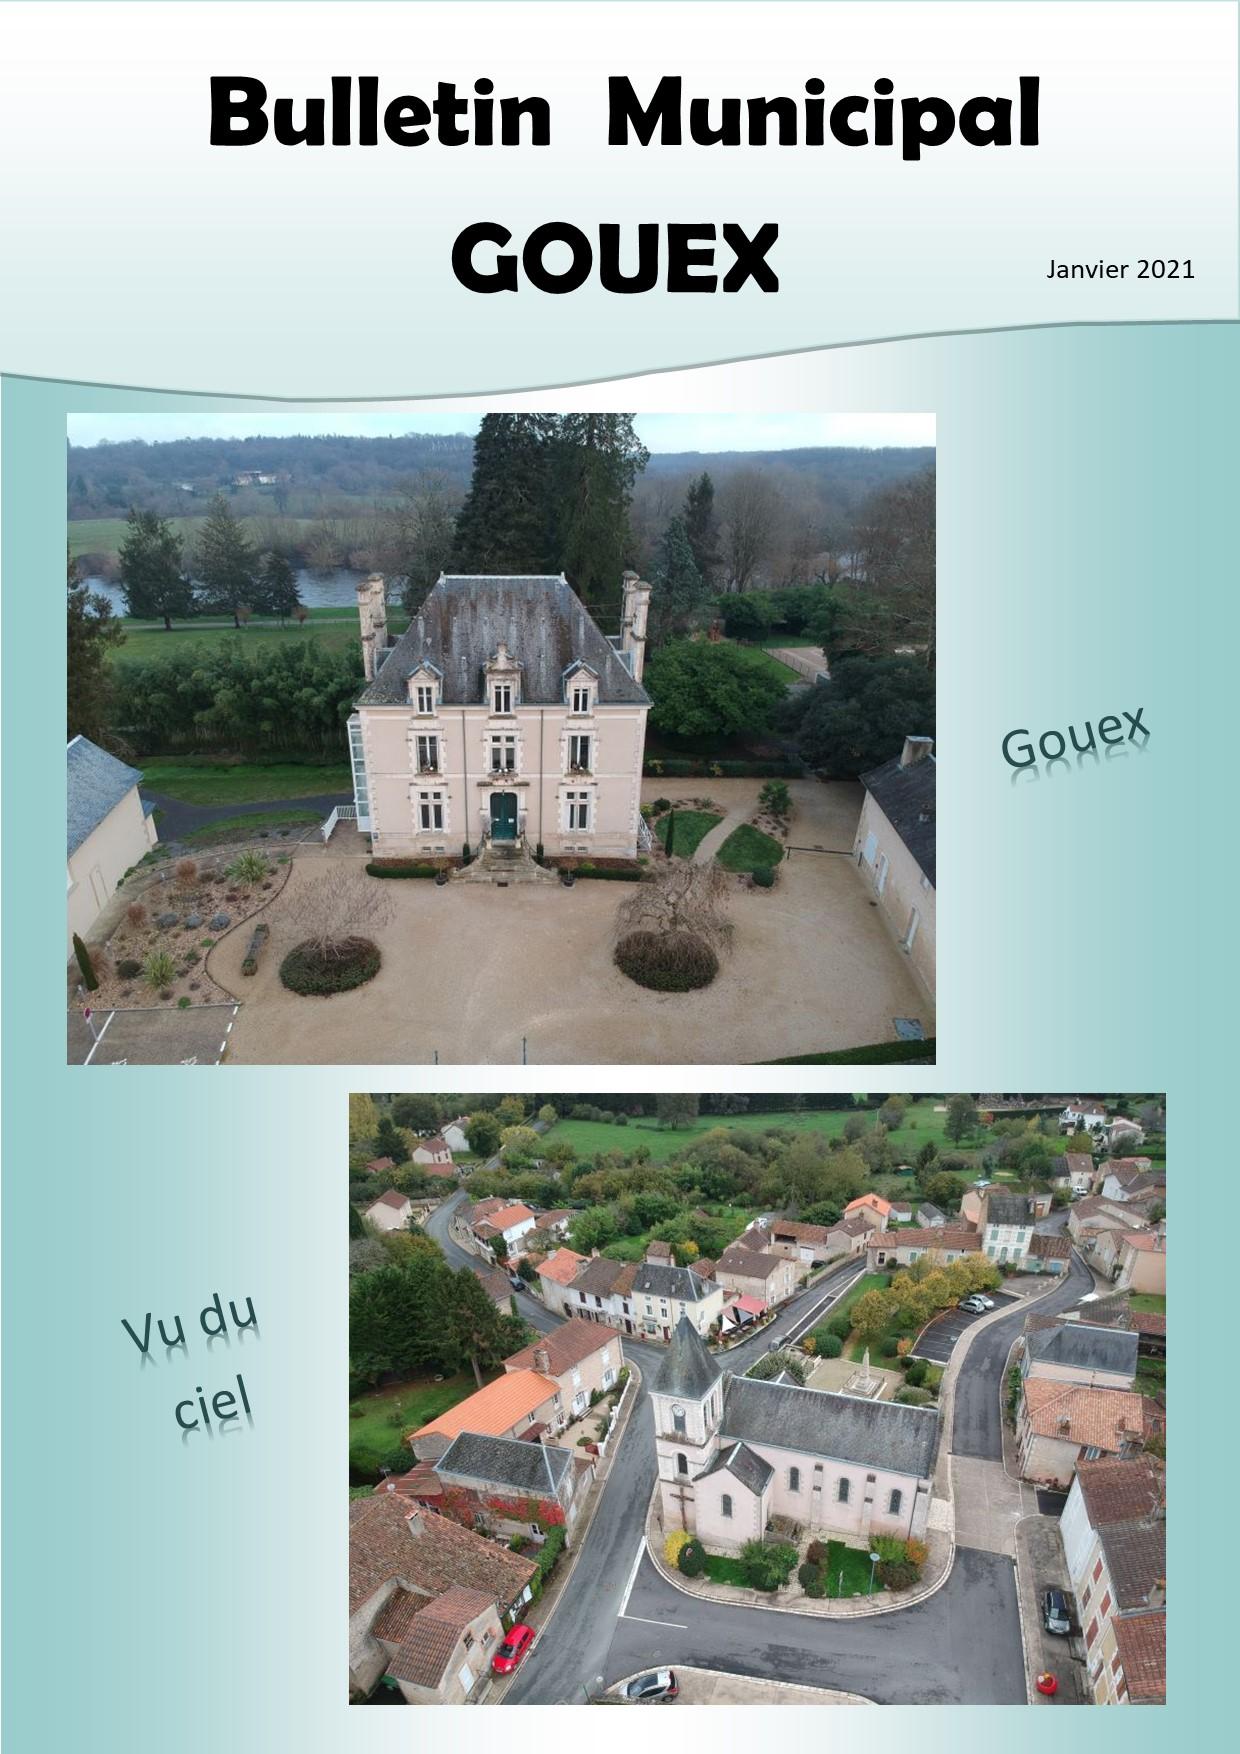 Couverture GOUEX 2020.jpg